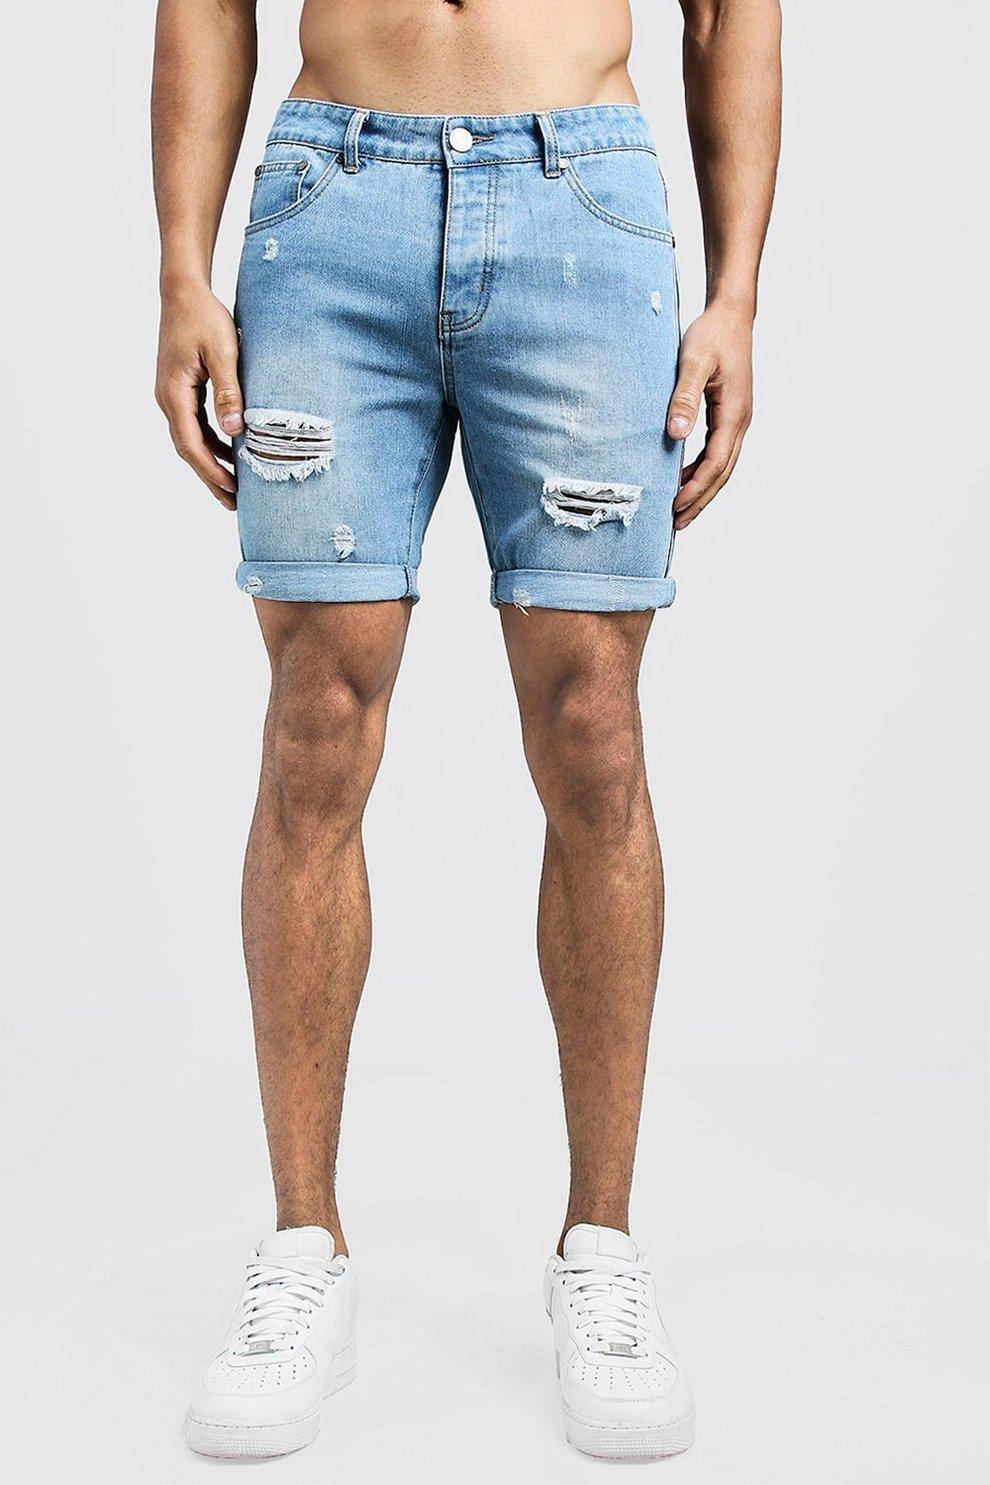 bd03ad8ecdd06 Mens Vintage wash Slim Fit Distressed Tape Detail Denim Shorts